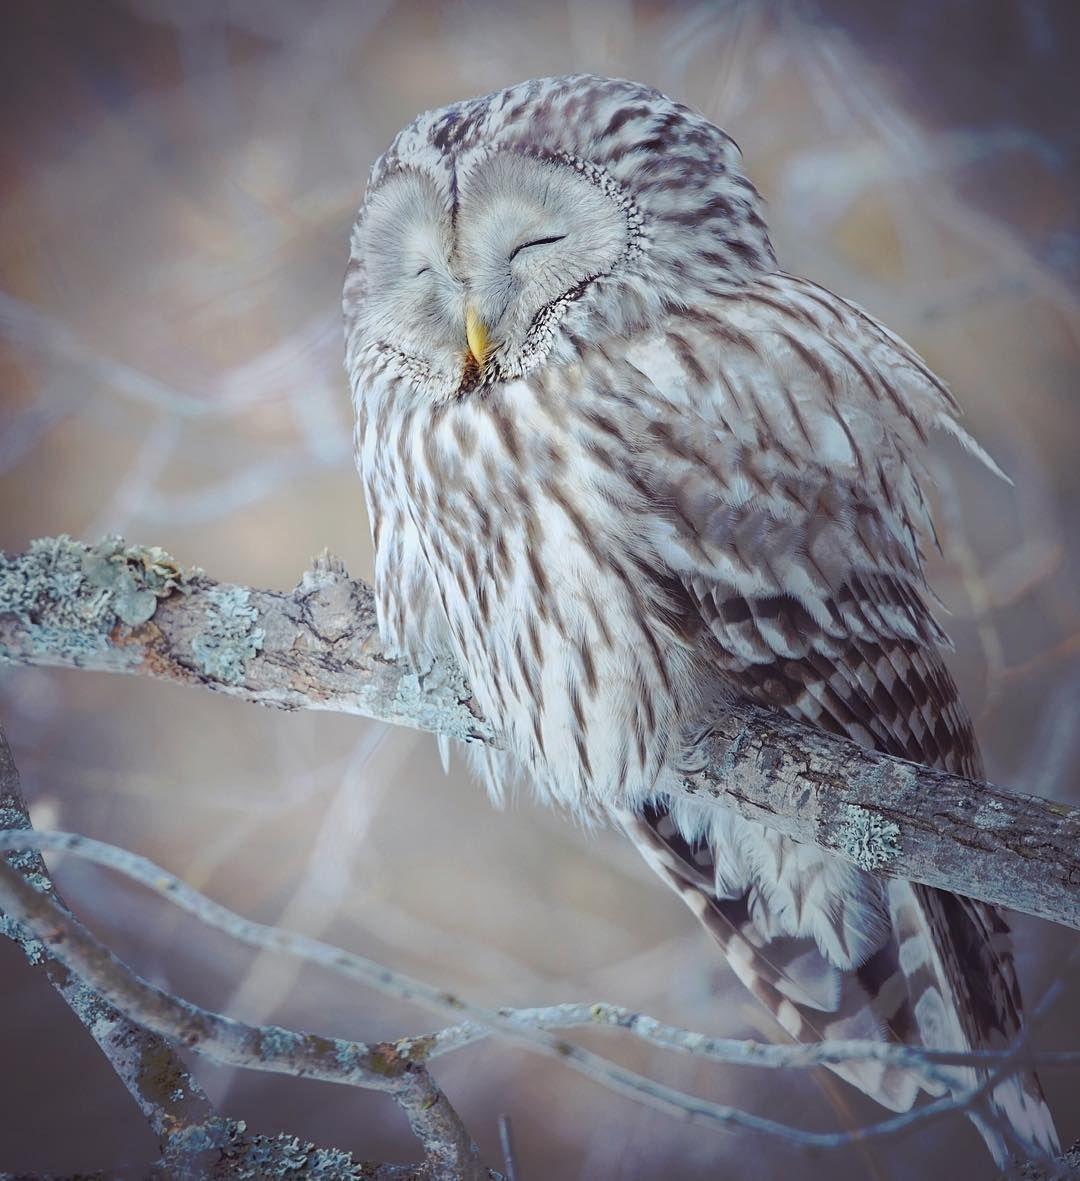 Ural owl (strix uralensis) sleeping on a branch. Finland  #marvelshots #photoarena_nature #splendid_animals #feather_perfection #WildGeography #GlobalDaily #bella_shots #elegantanimals #animalelite #exklusive_nature #shotaward #wonderfulworld #amazing_picturez #igscwildlife #animalsmood #exelent_nature #exclusive_animals #planet_of_animals #perfection_nature #pro_nature #greatshots #greatphotos #masters #master_shots #magic_shots #nature_of_our_world #igscwildlife #IgAnimal_Snapsk…